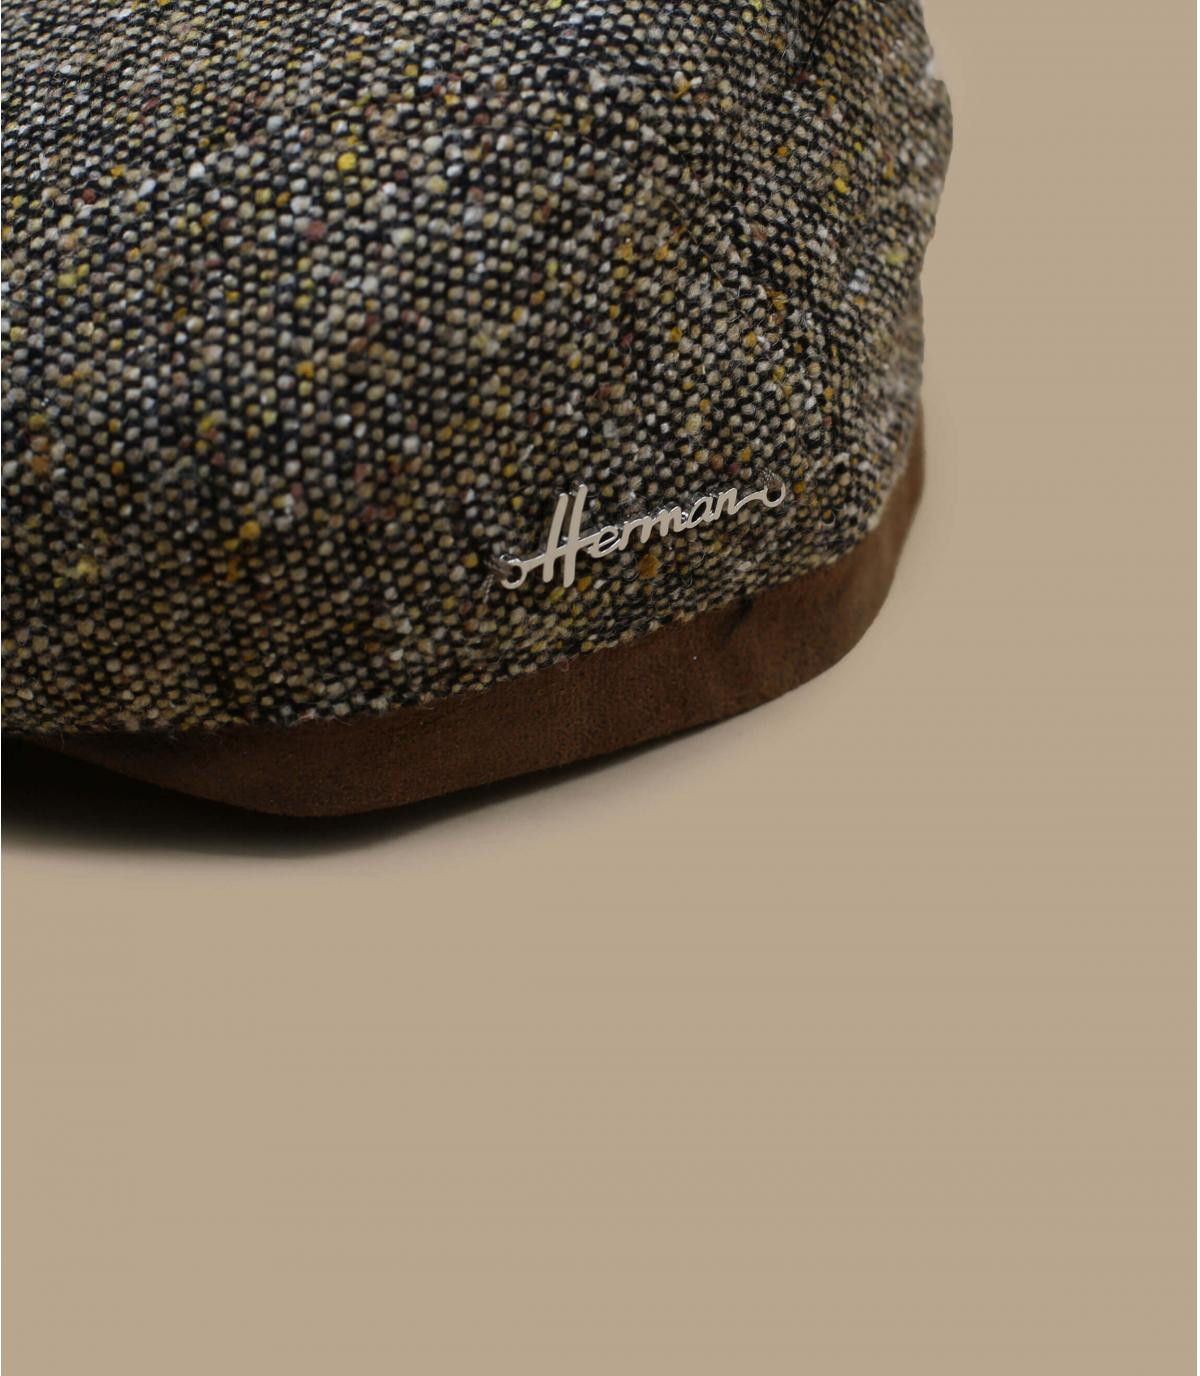 Details Grasberg Wool taupe - Abbildung 2